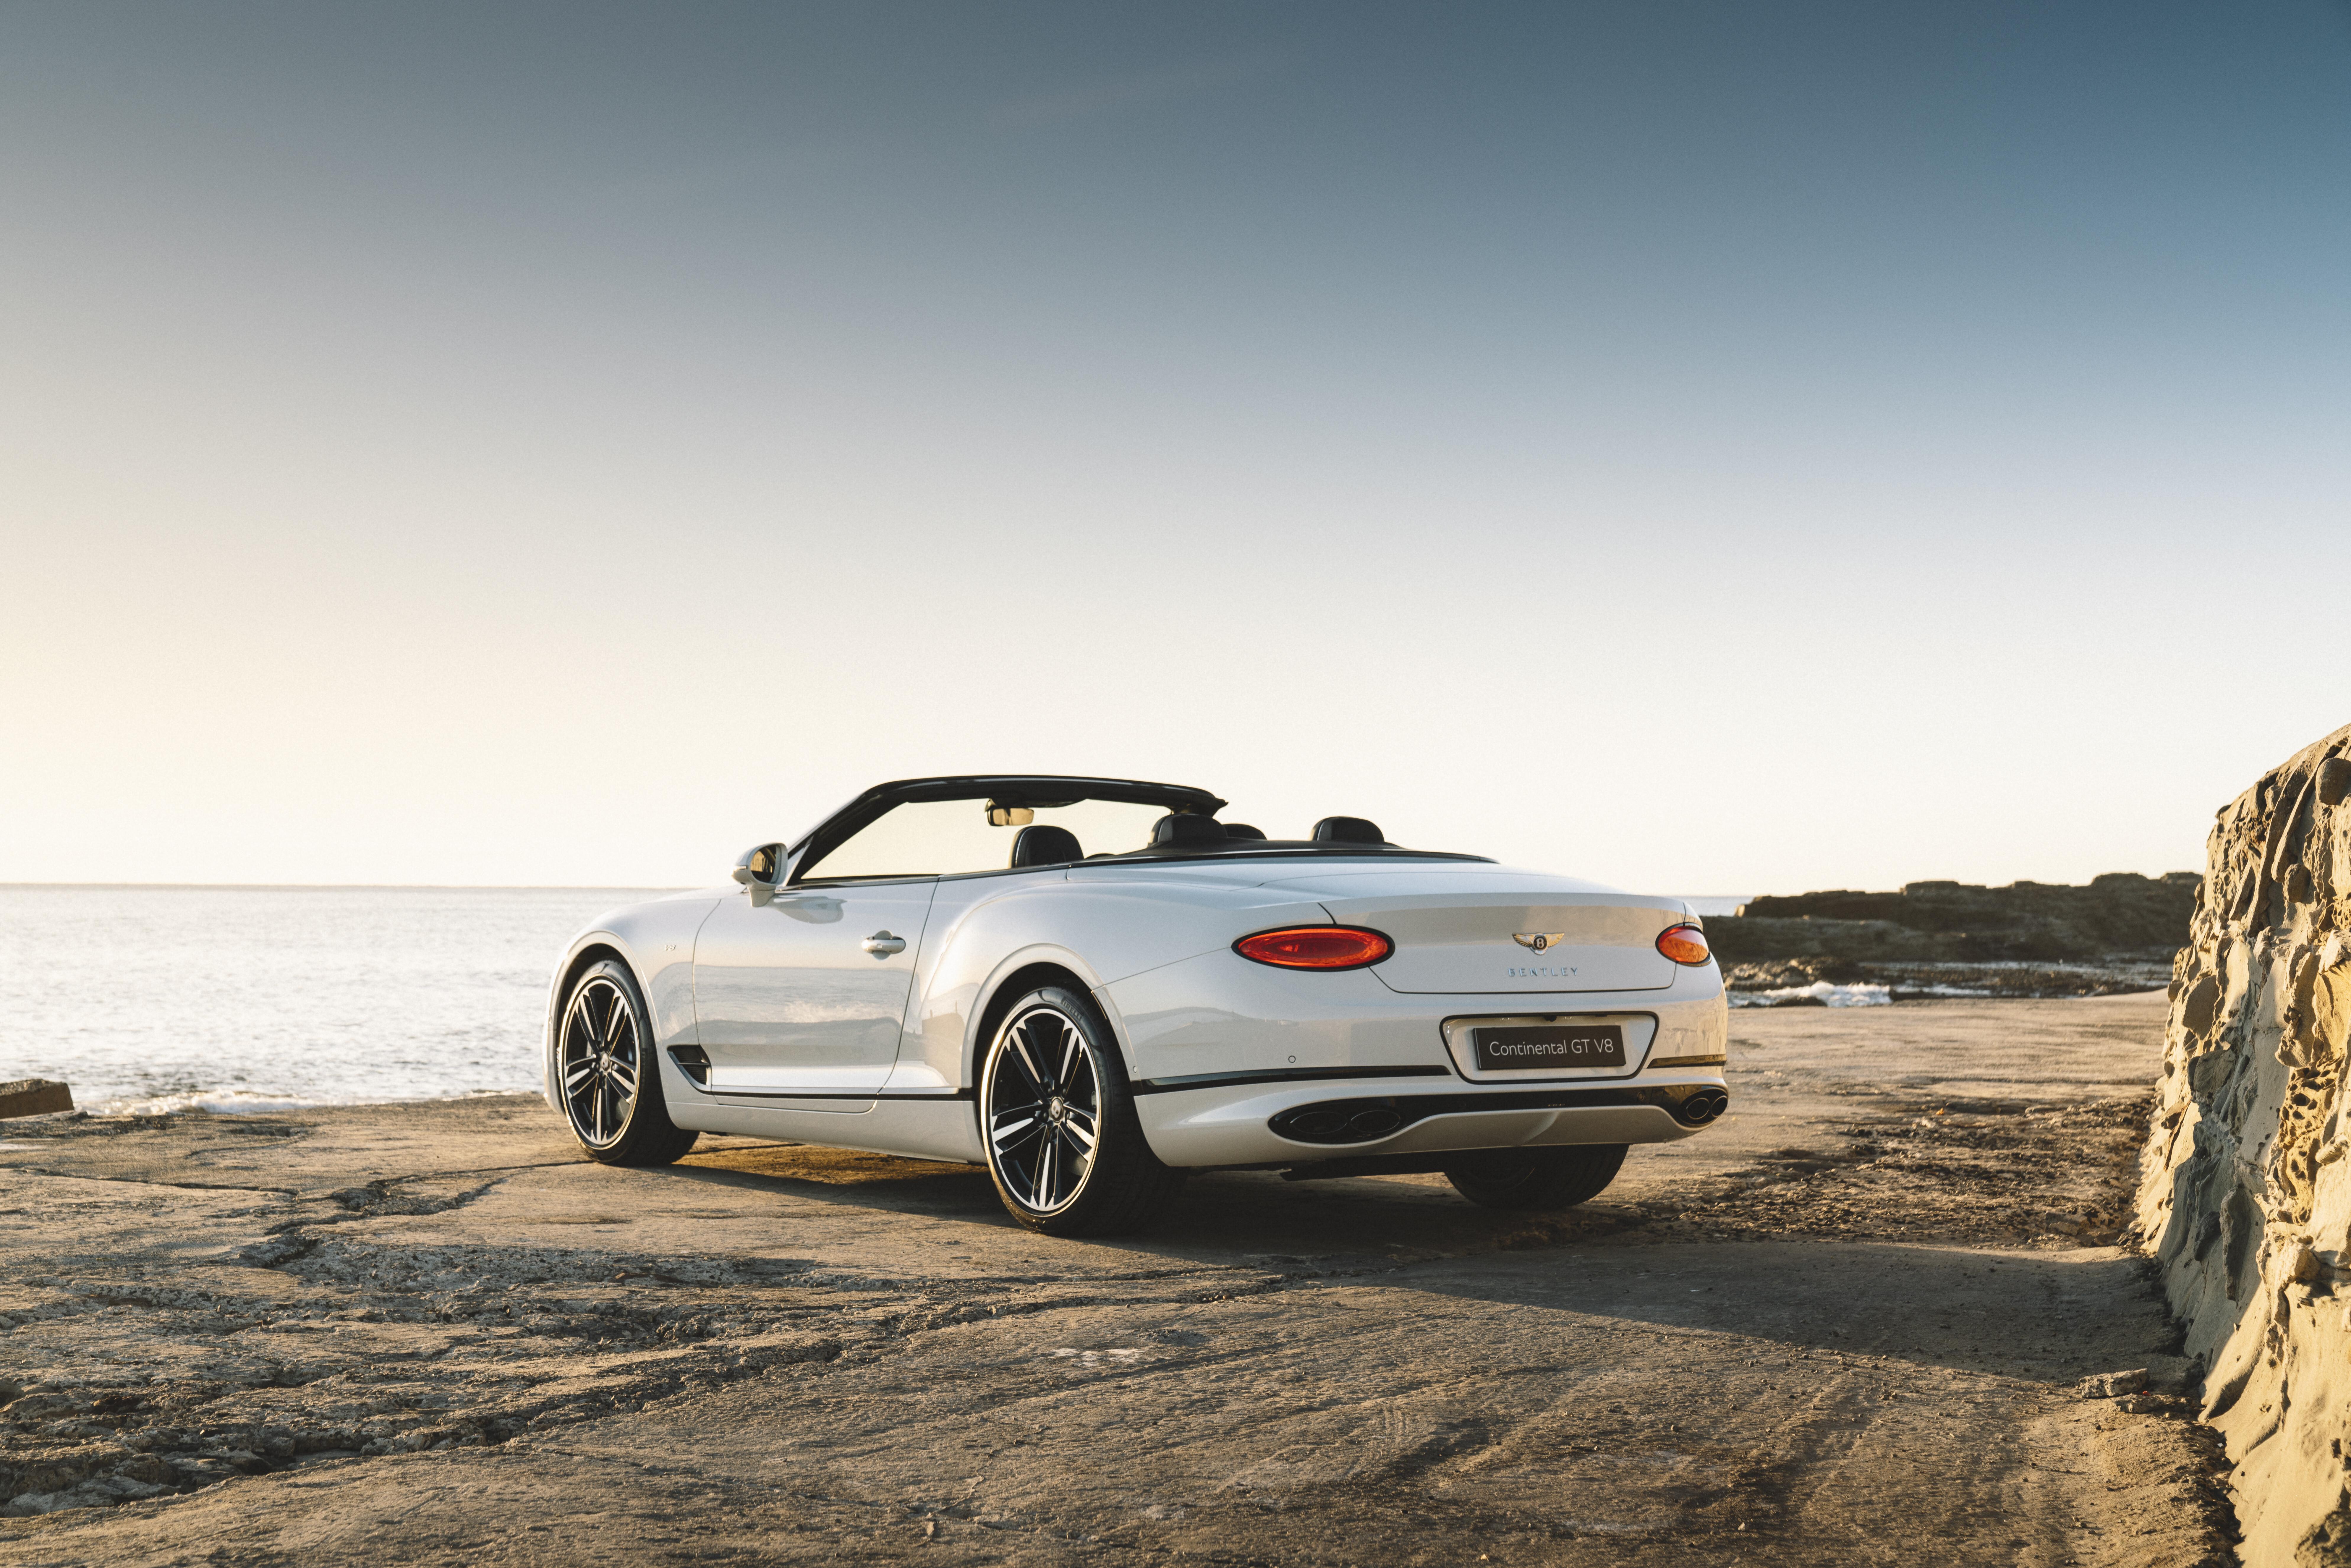 Motor Reviews Bentley Continental GTC V 8 Rear